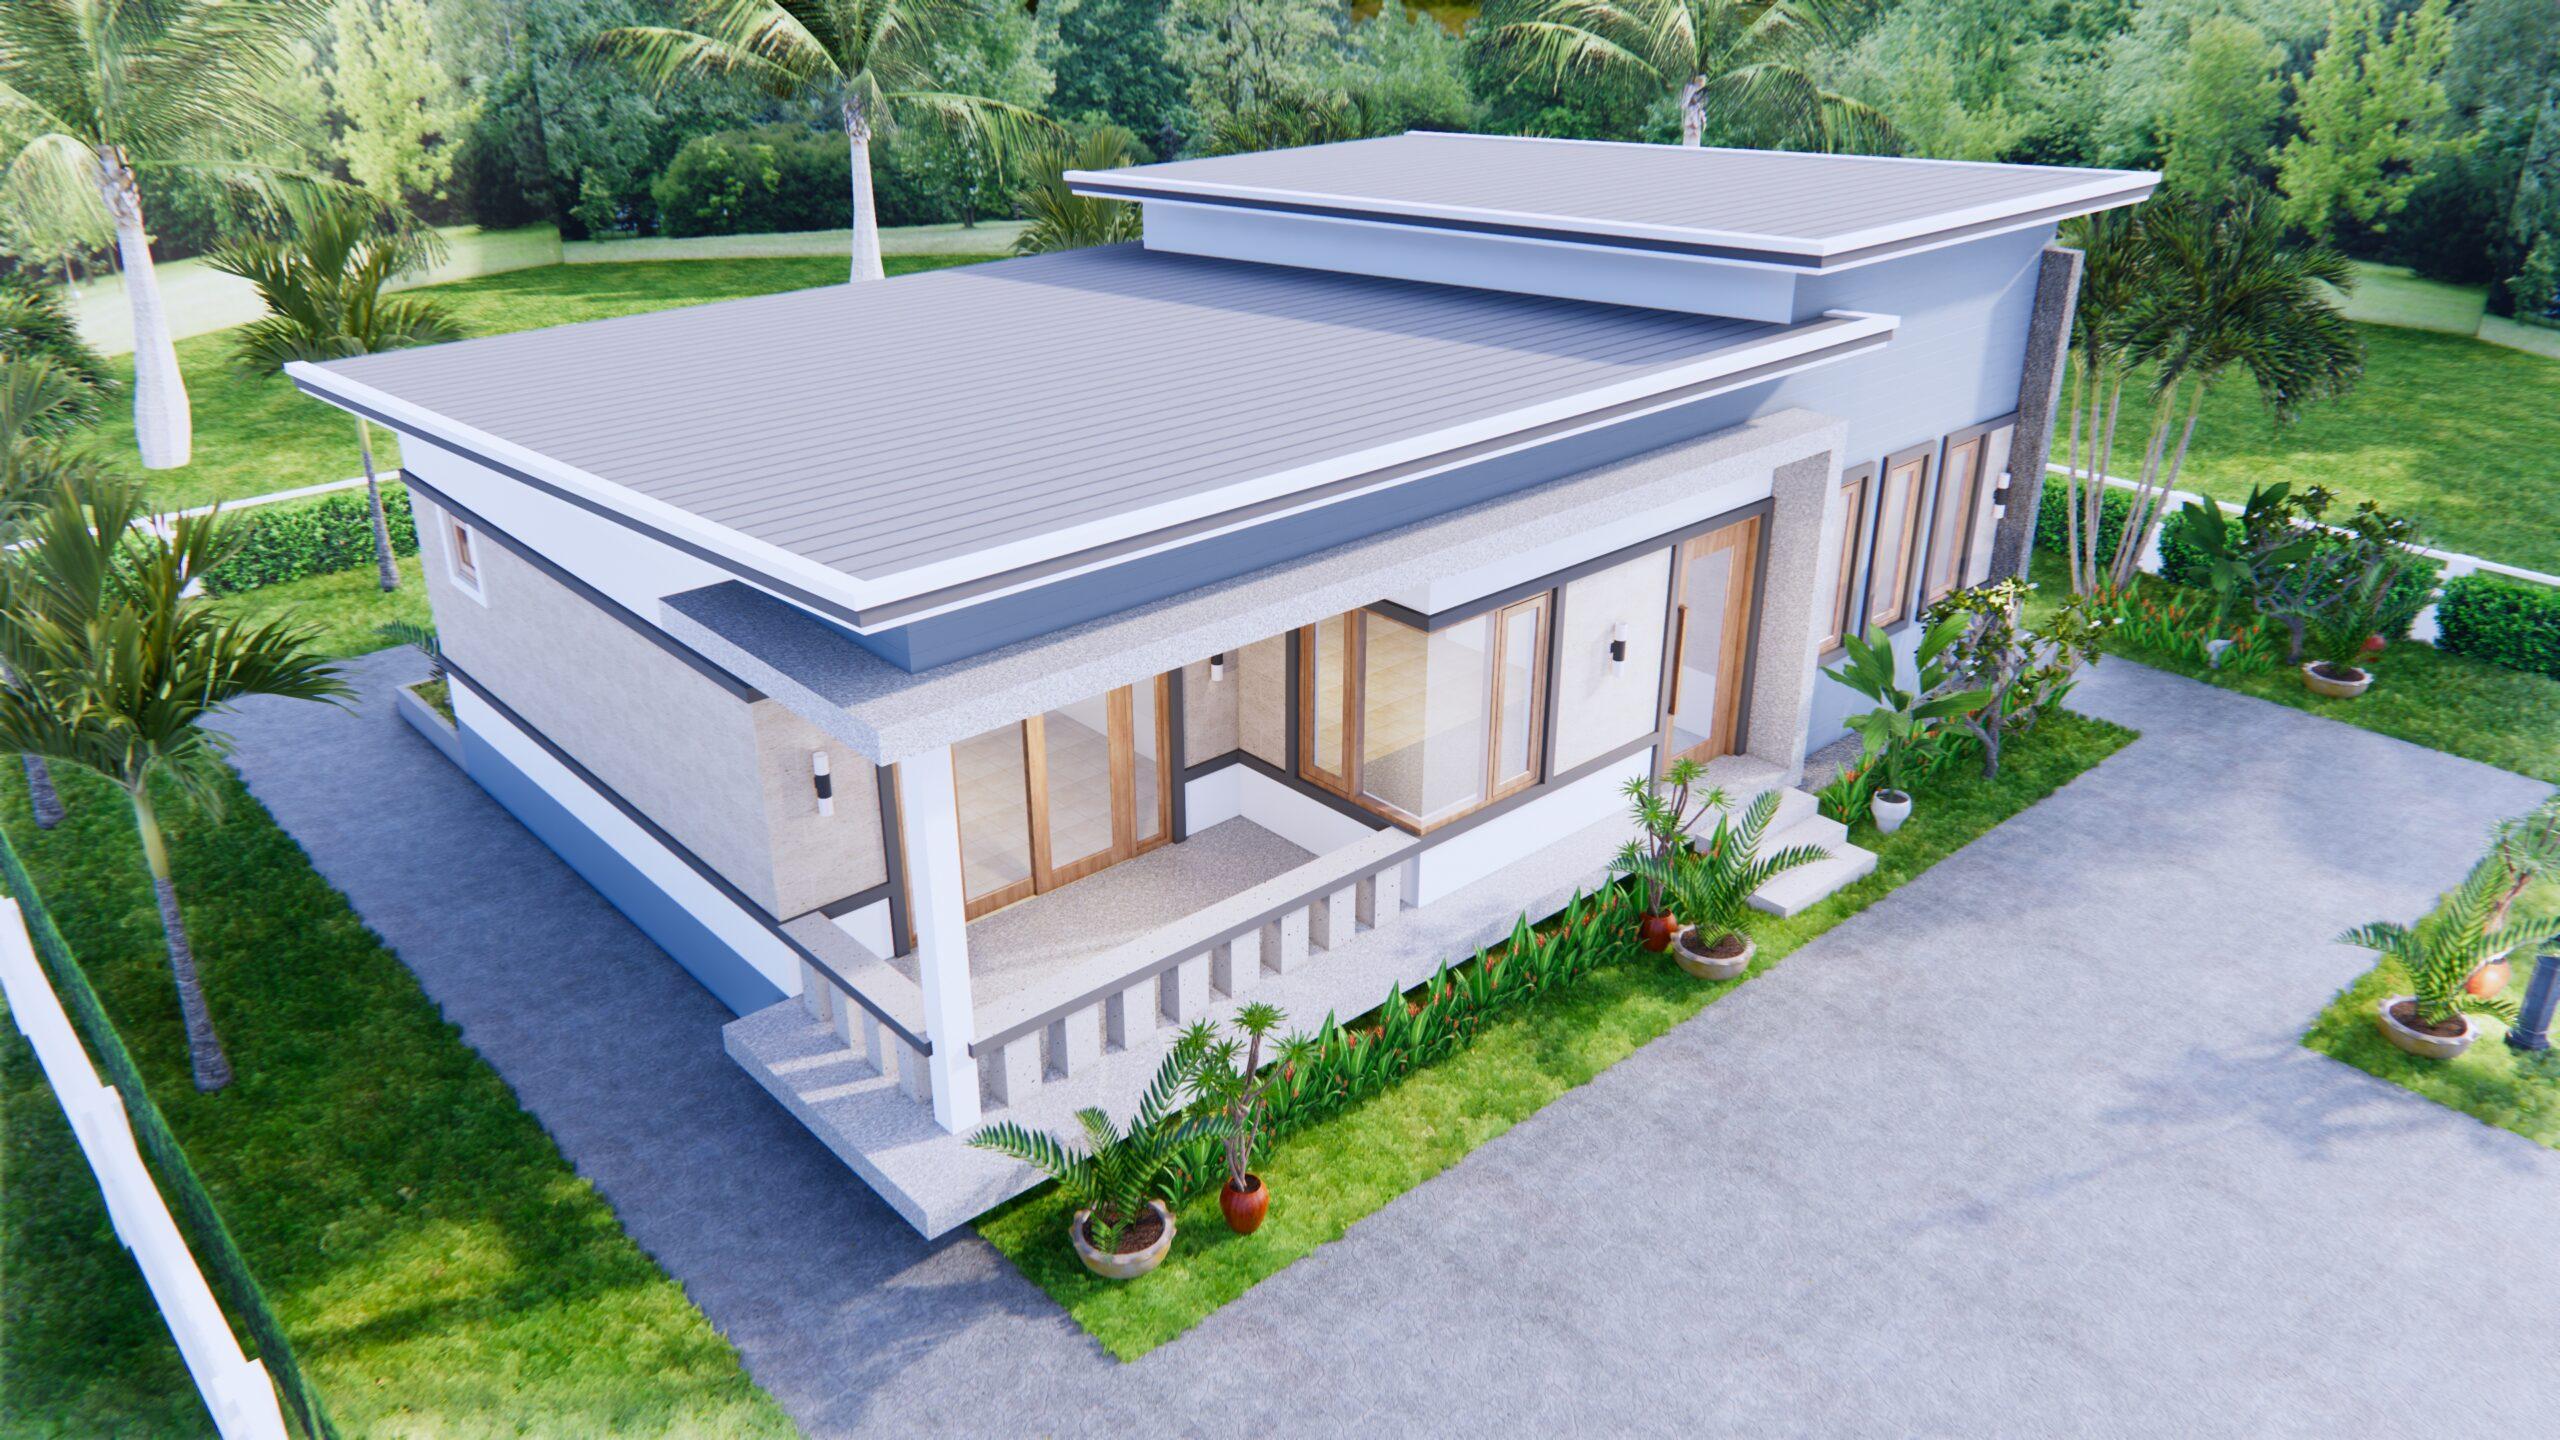 1 Story Modern House 12x12 Meters 40x40 Feet 3 Beds 3